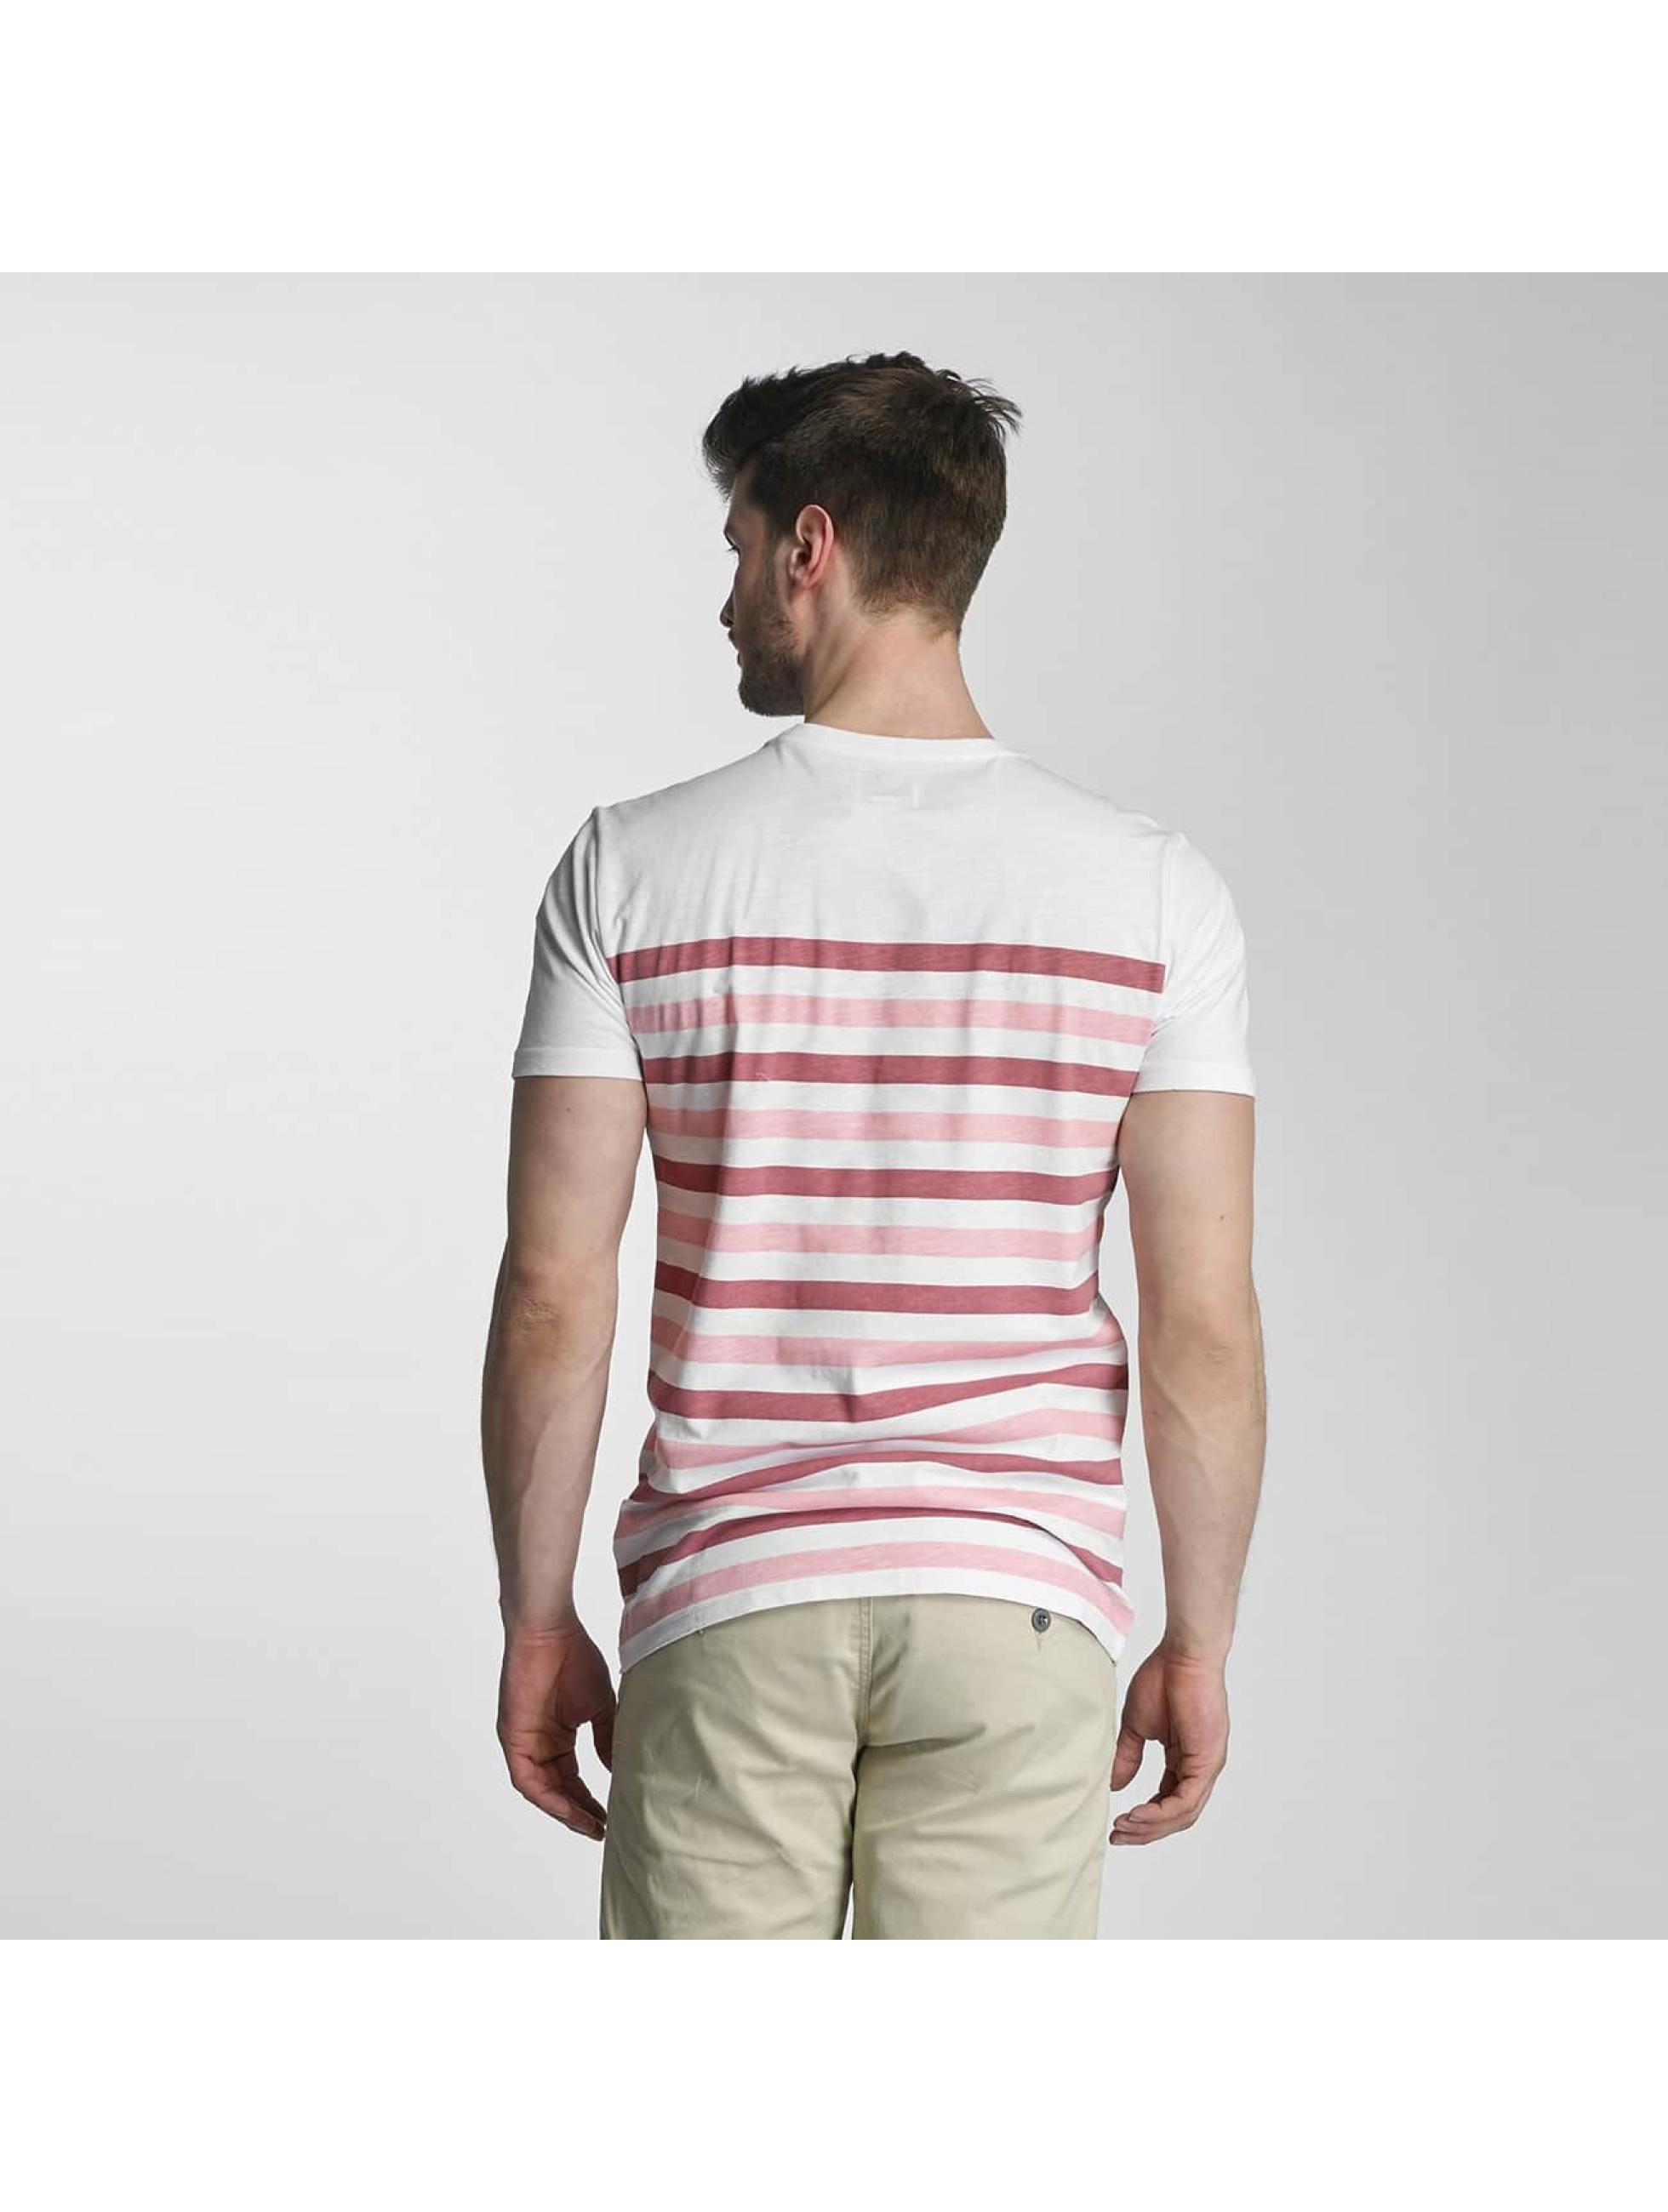 SHINE Original Camiseta Striped rosa